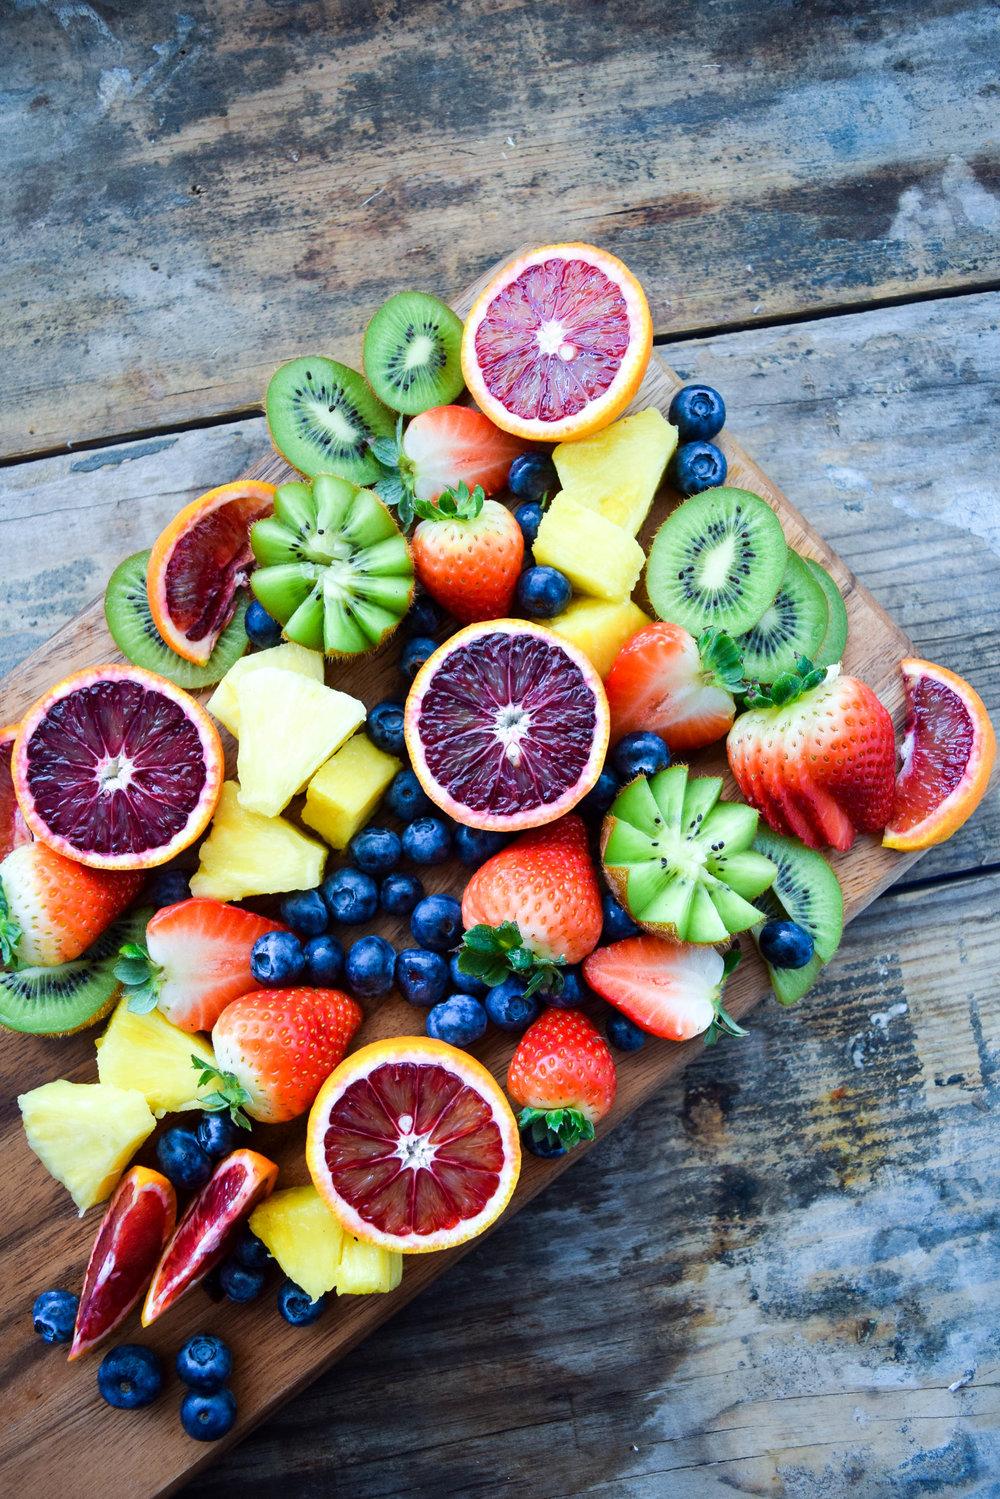 vegan-fruit-serving-board.jpg